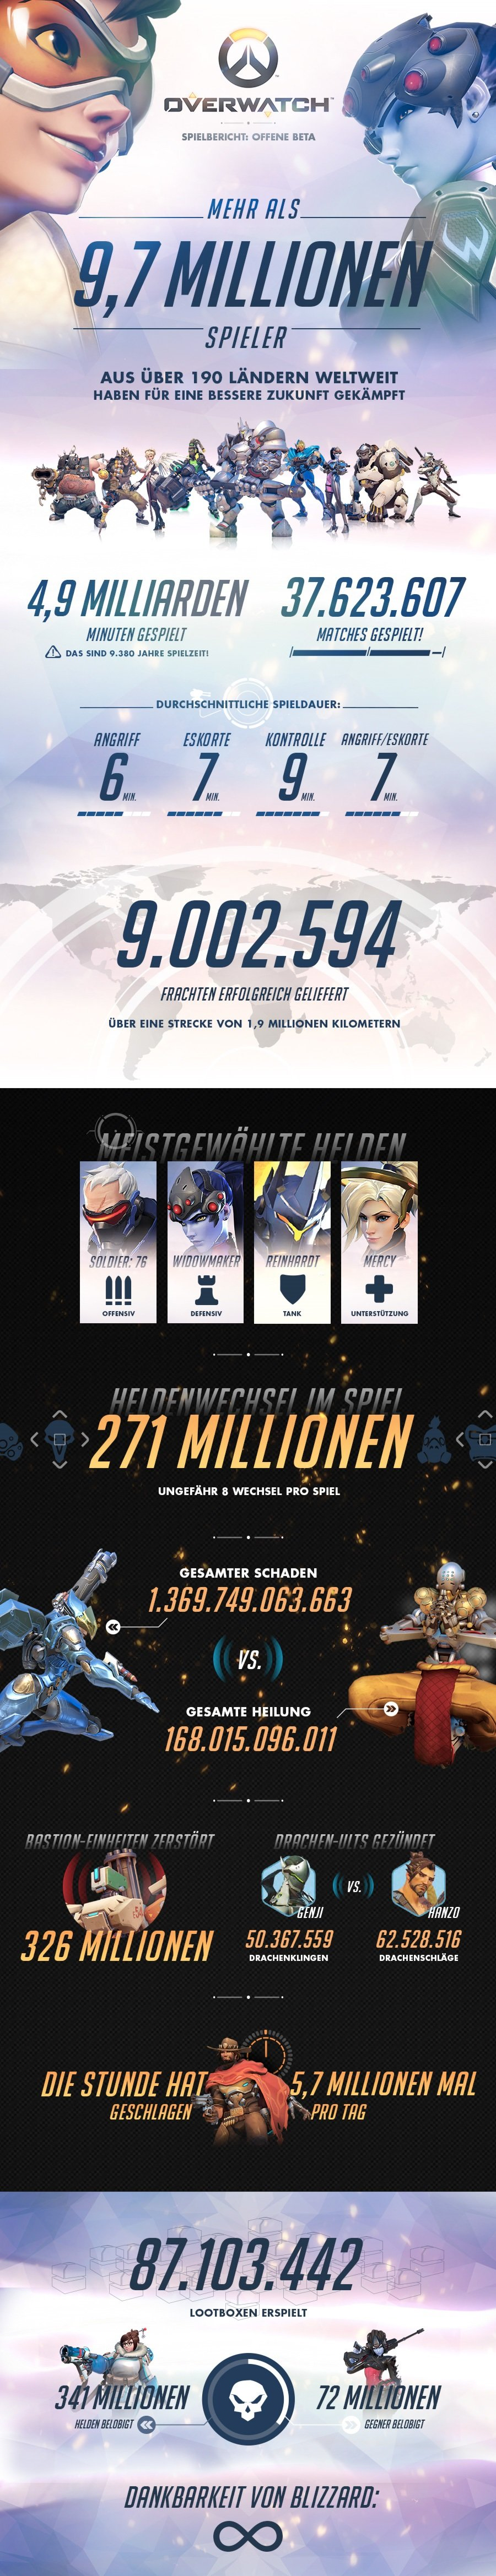 infografik-overwatch